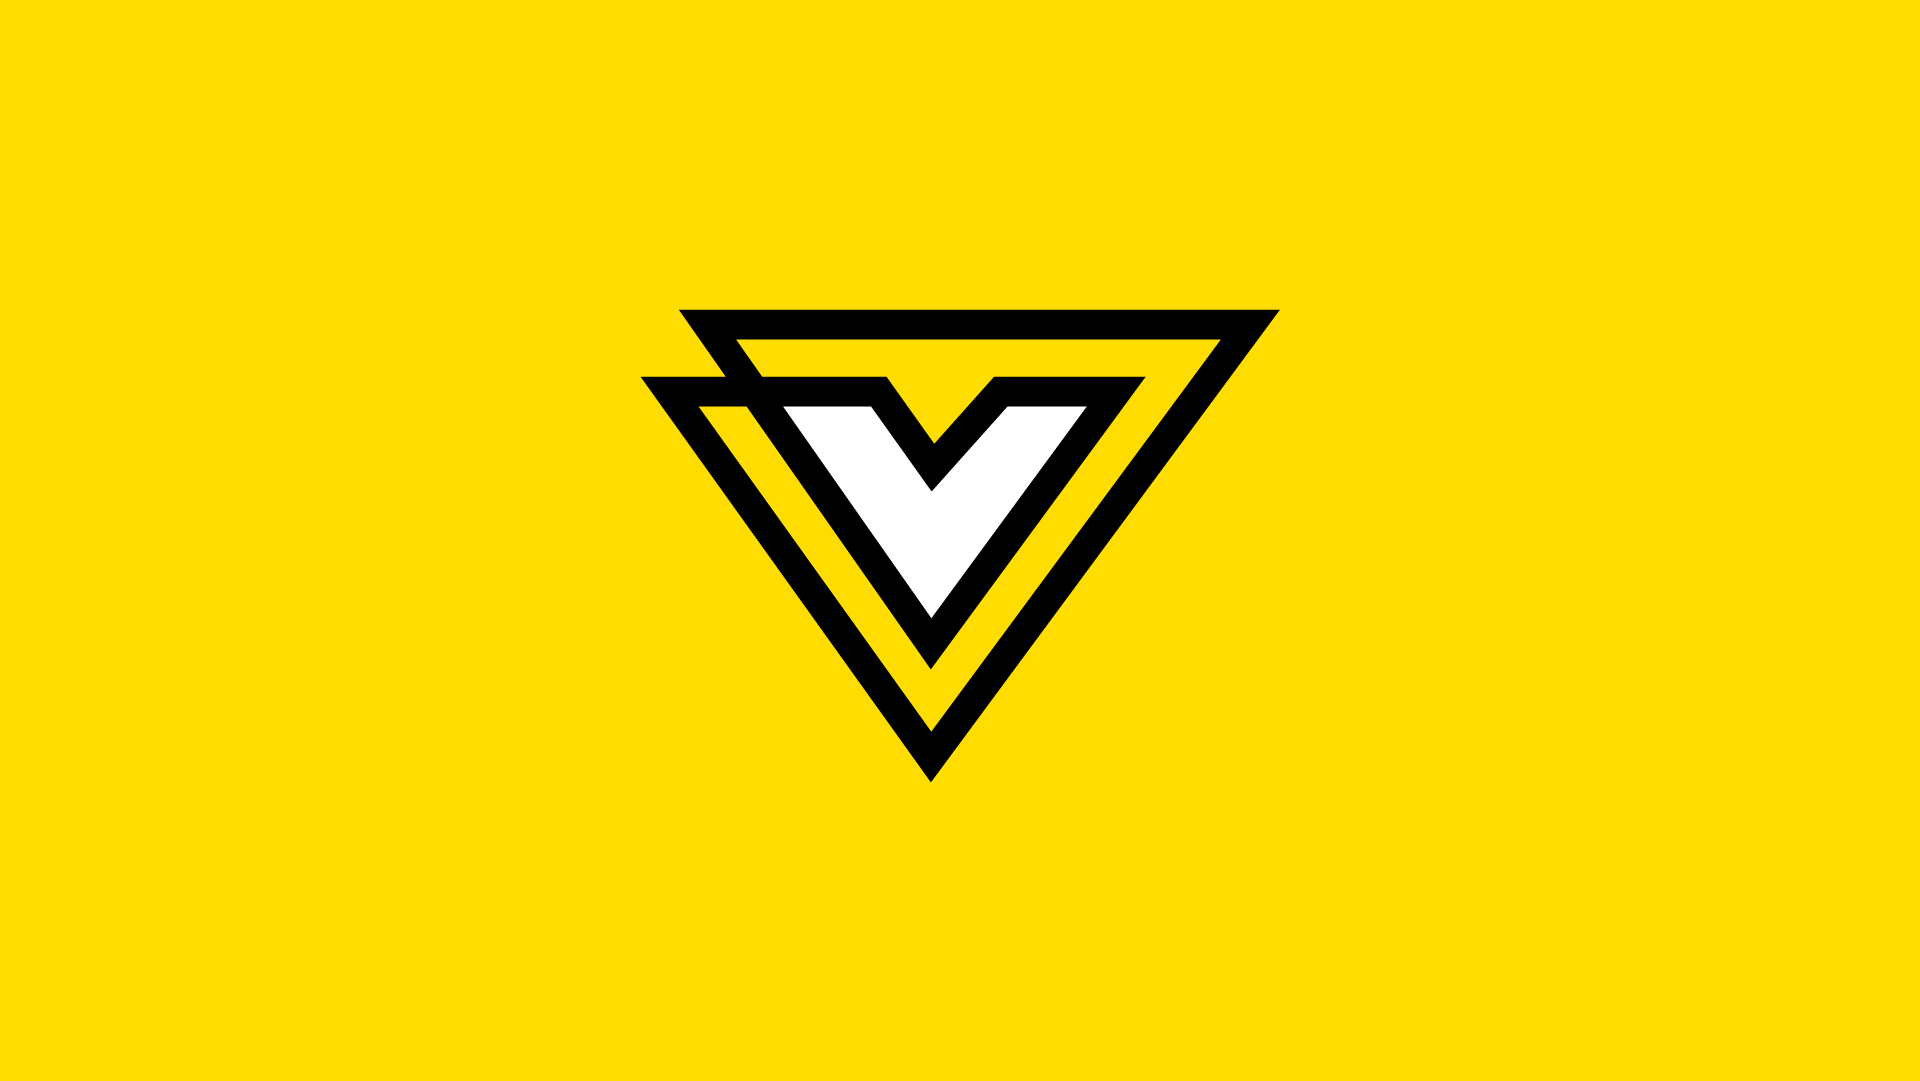 vrv_logos-04.png